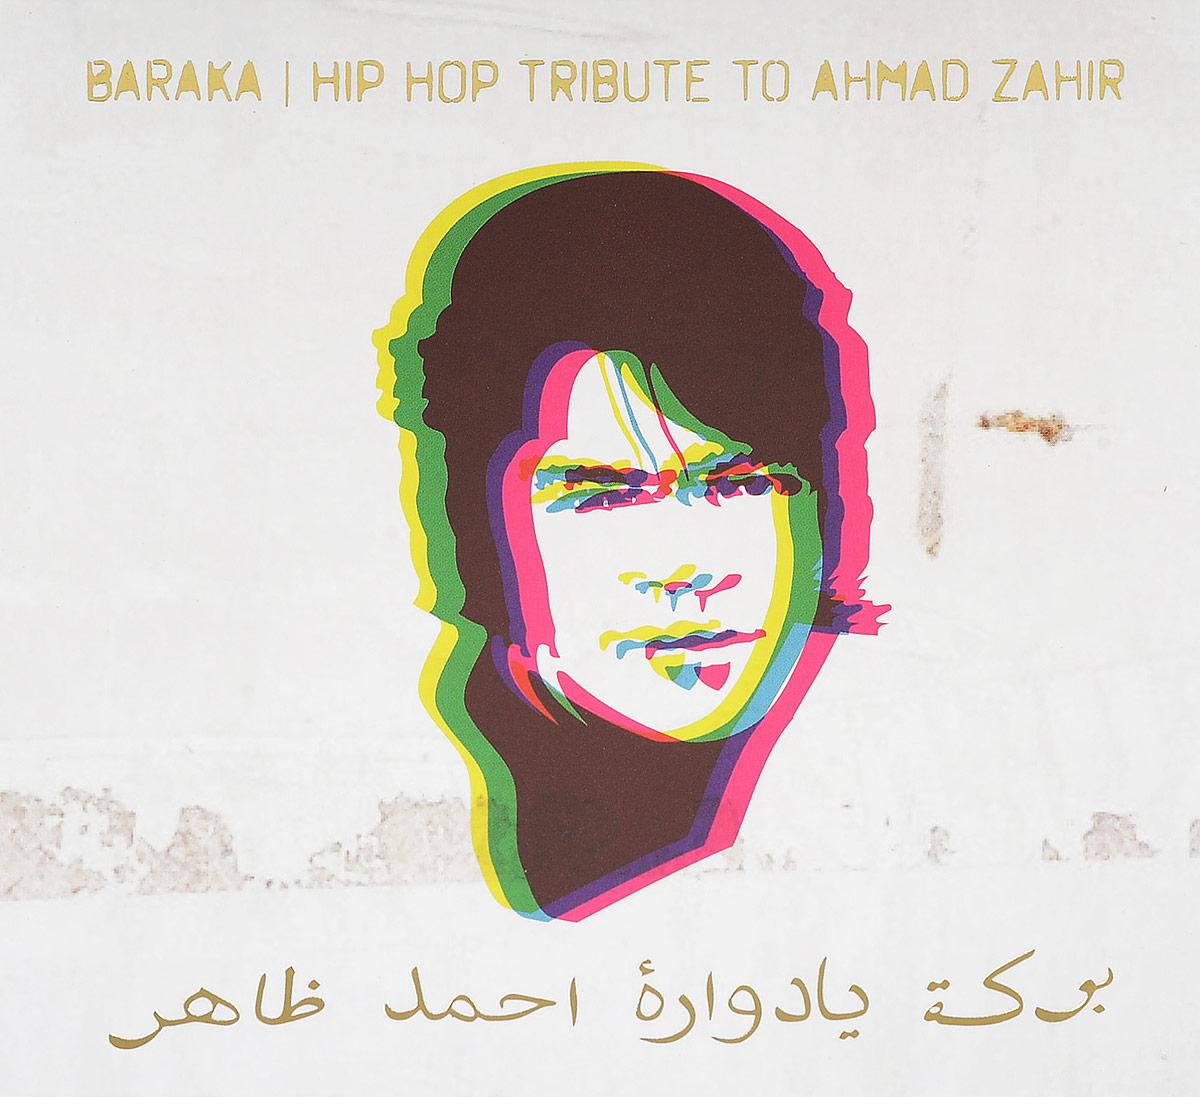 Baraka Baraka. Hip-Hop Tribute To Ahmad Zahir coelho p the zahir